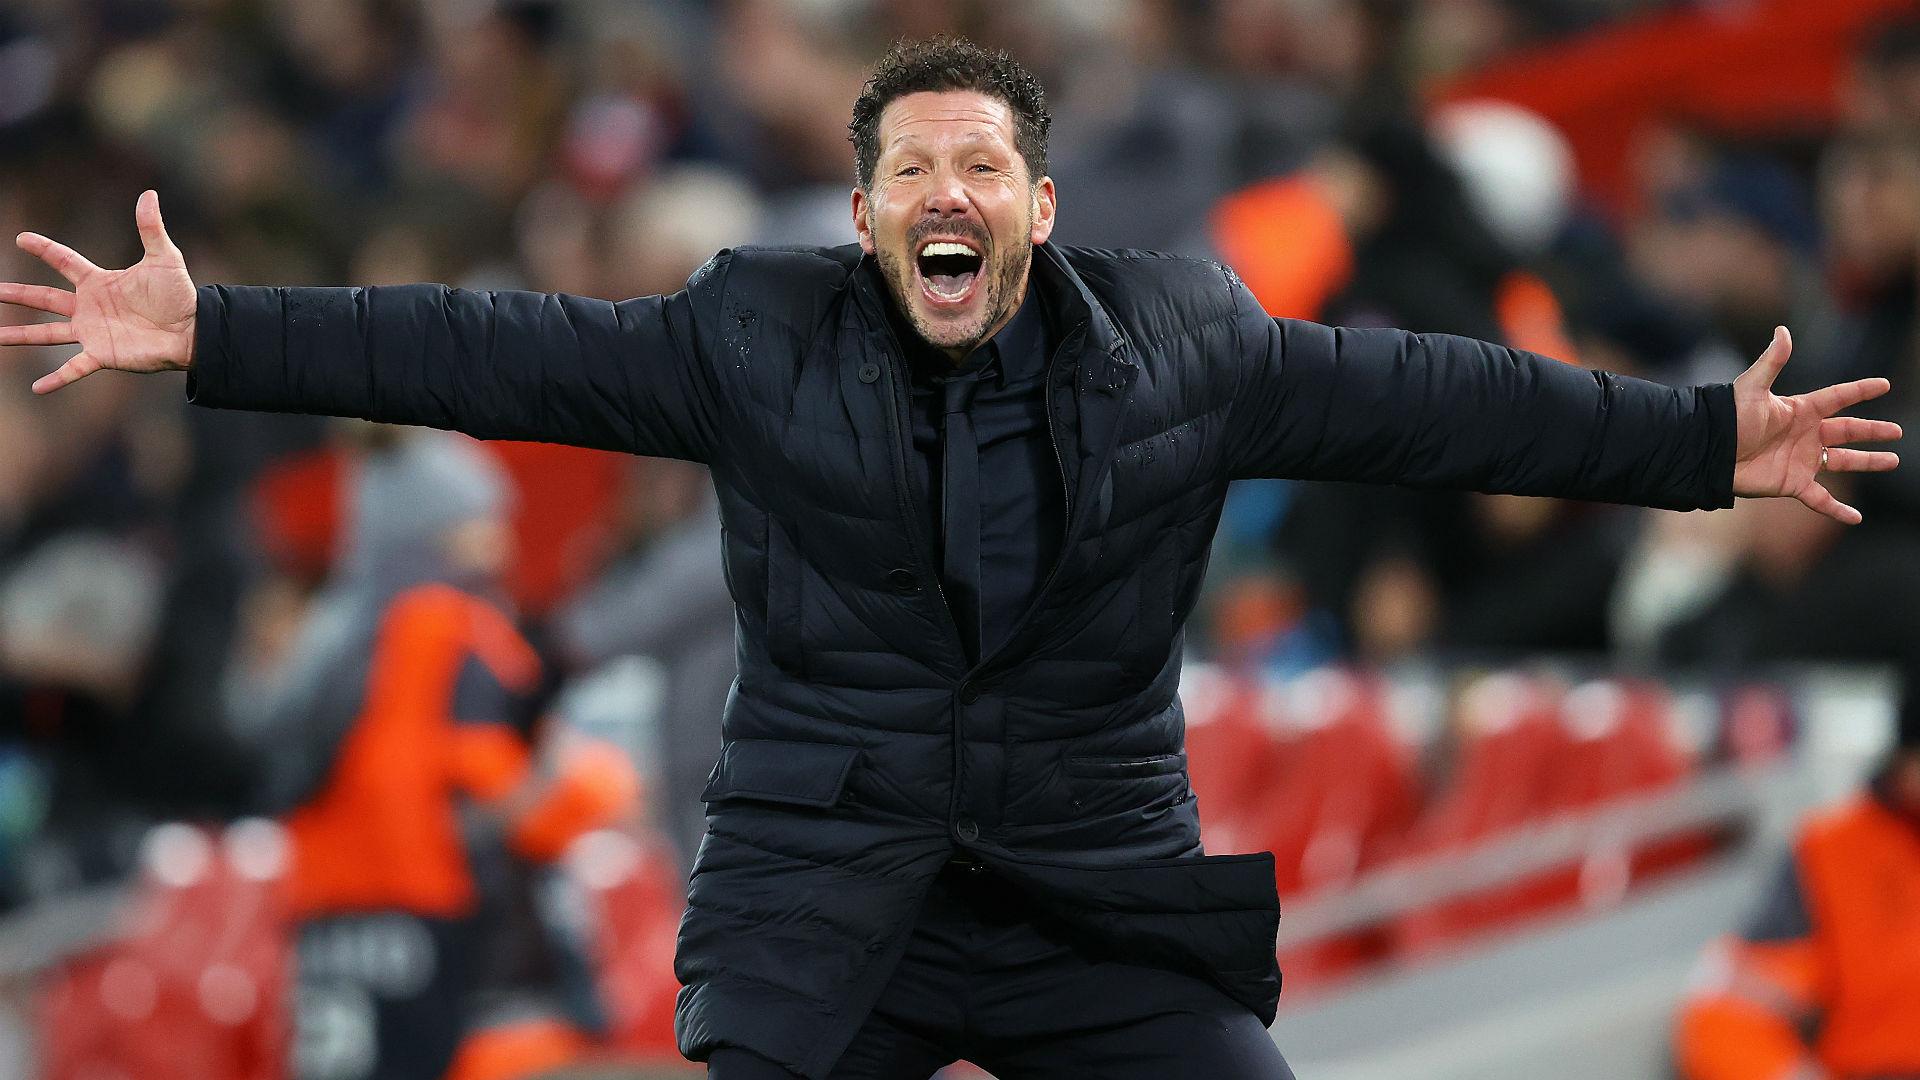 Diego Simeone has a job for life at Atletico, says Unai Emery